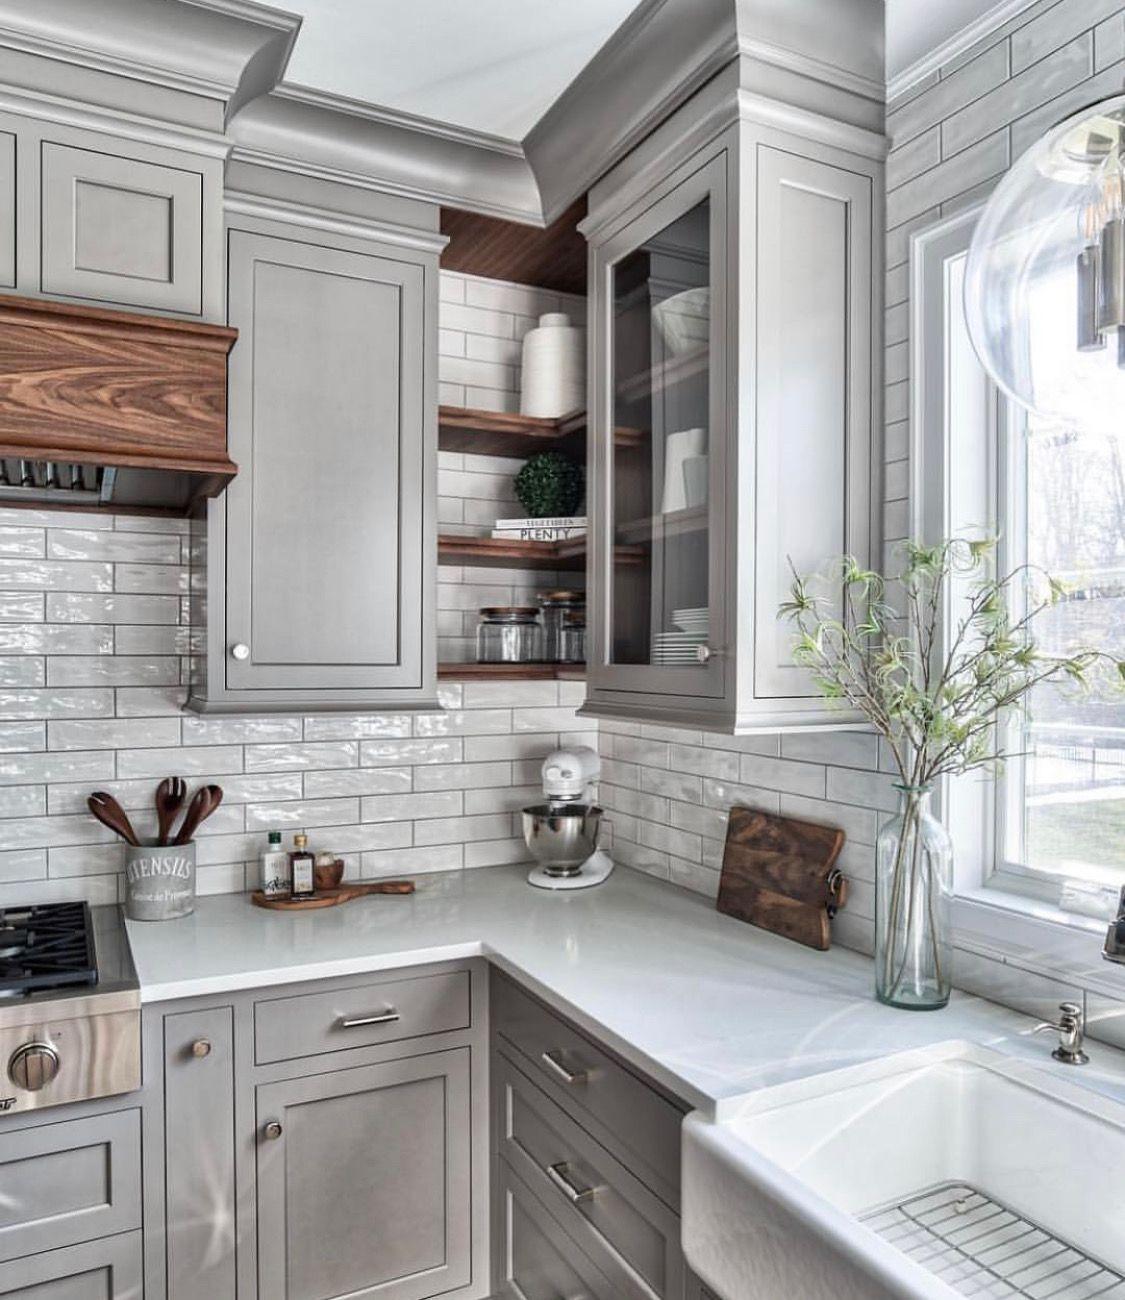 Grey Cabinets And Corner Shelving Grey Kitchen Designs Kitchen Cabinet Design Kitchen Interior